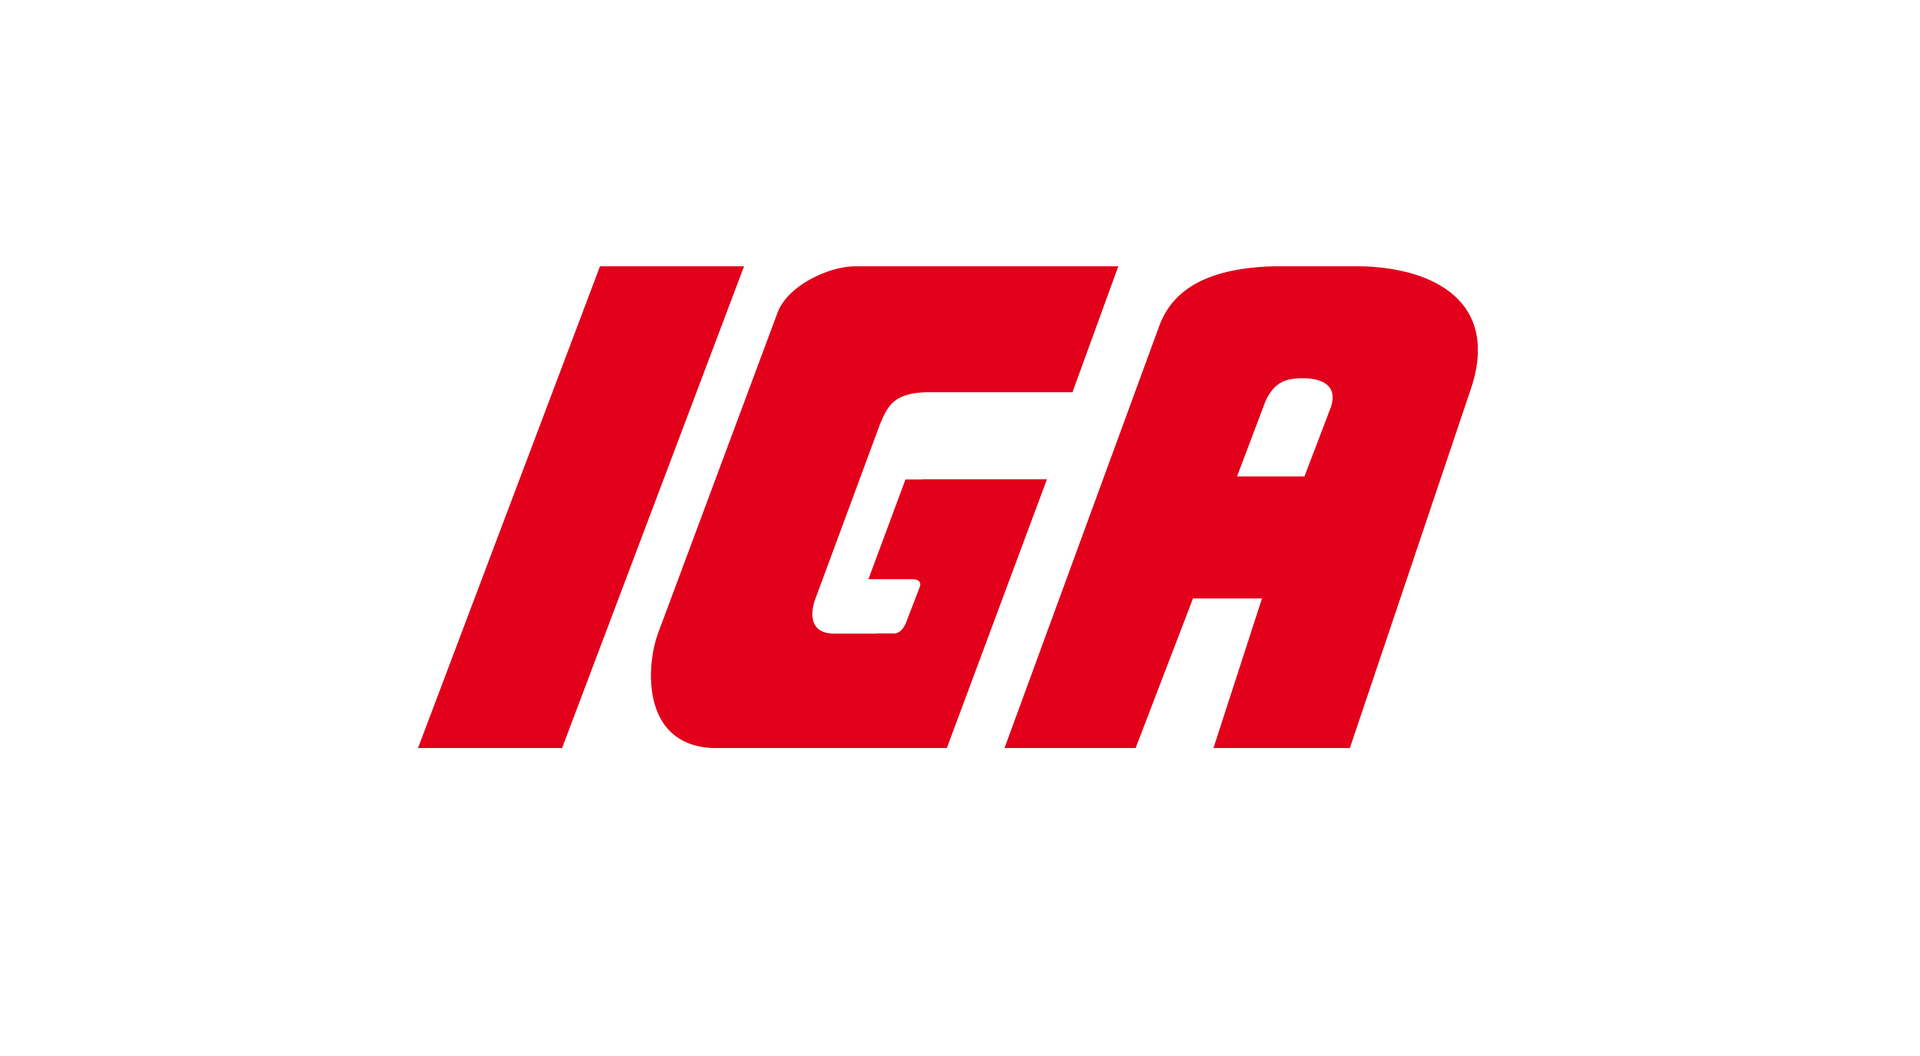 Marché IGA